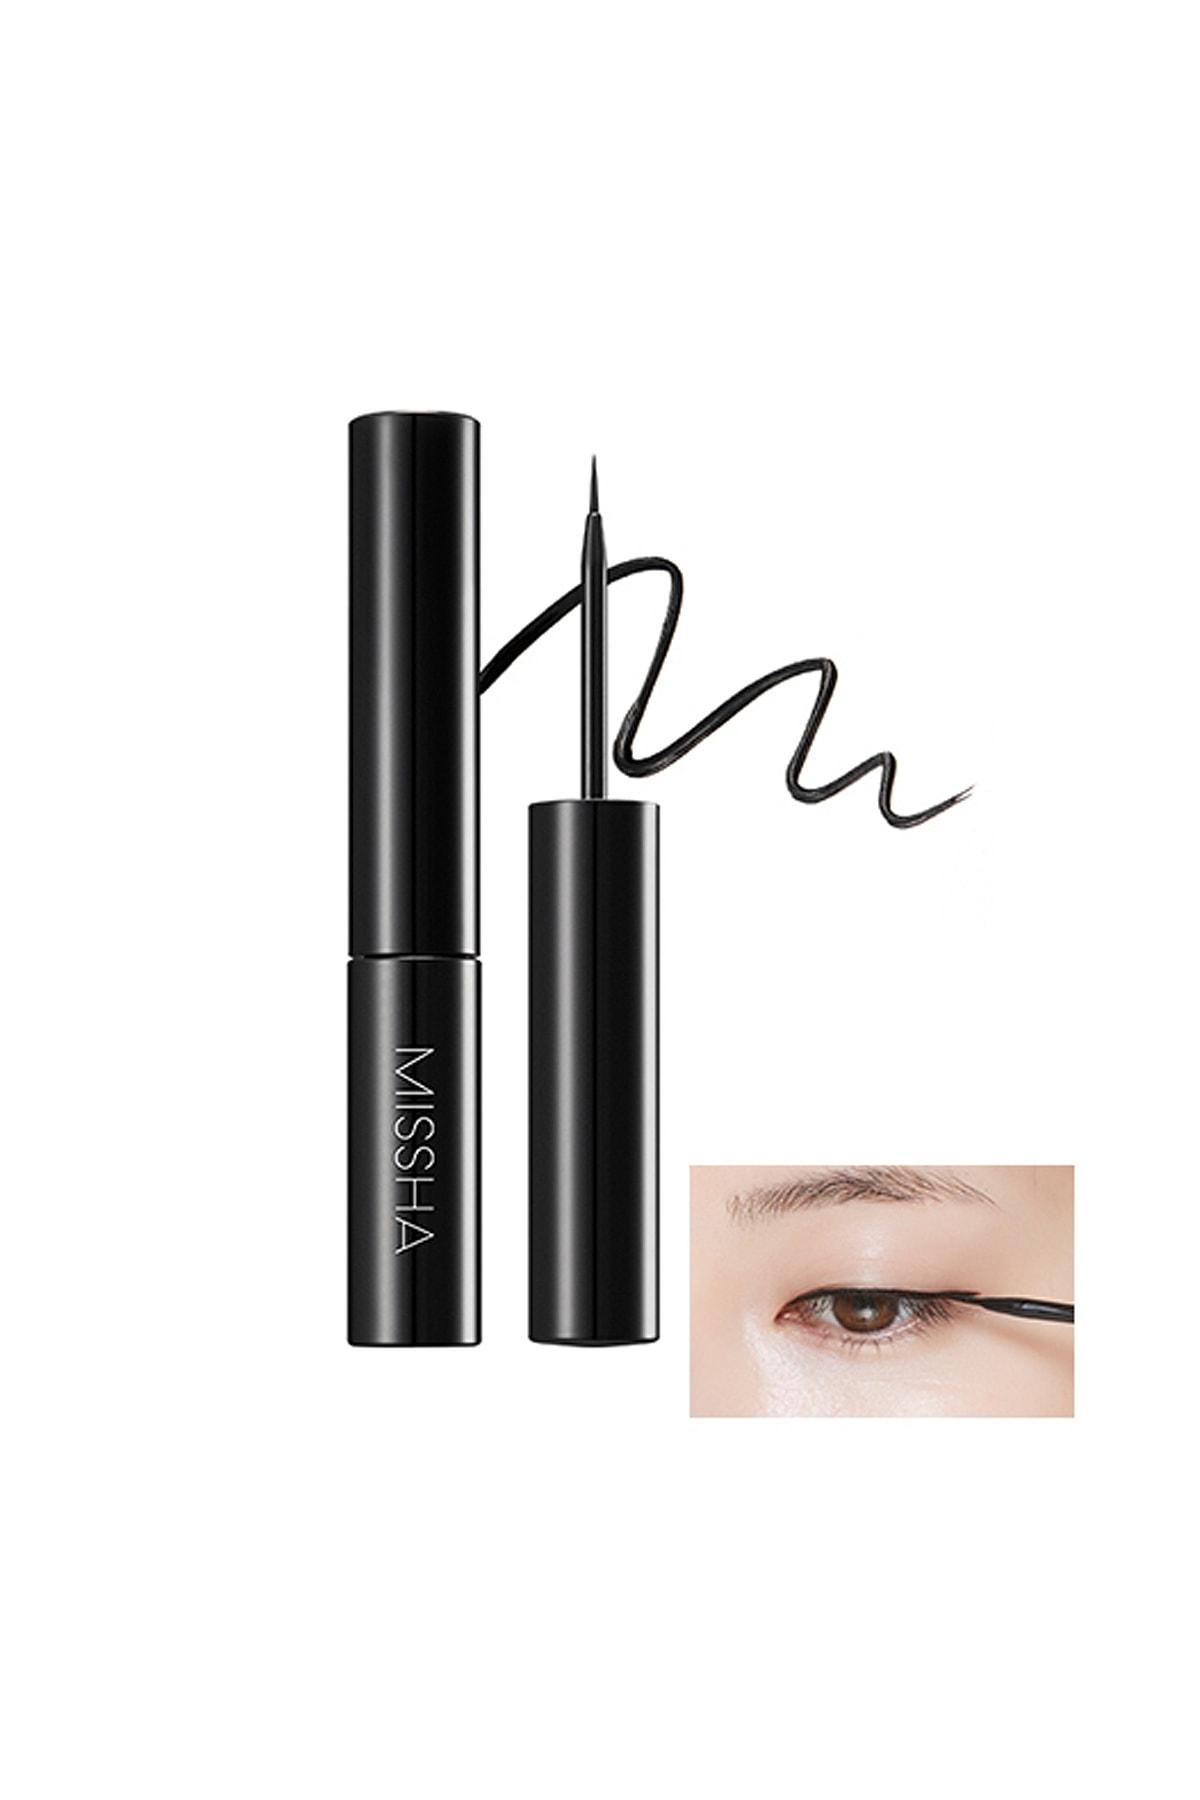 Missha Suya Dayanıklı Likit Eyeliner Liquid Sharp Liner 1